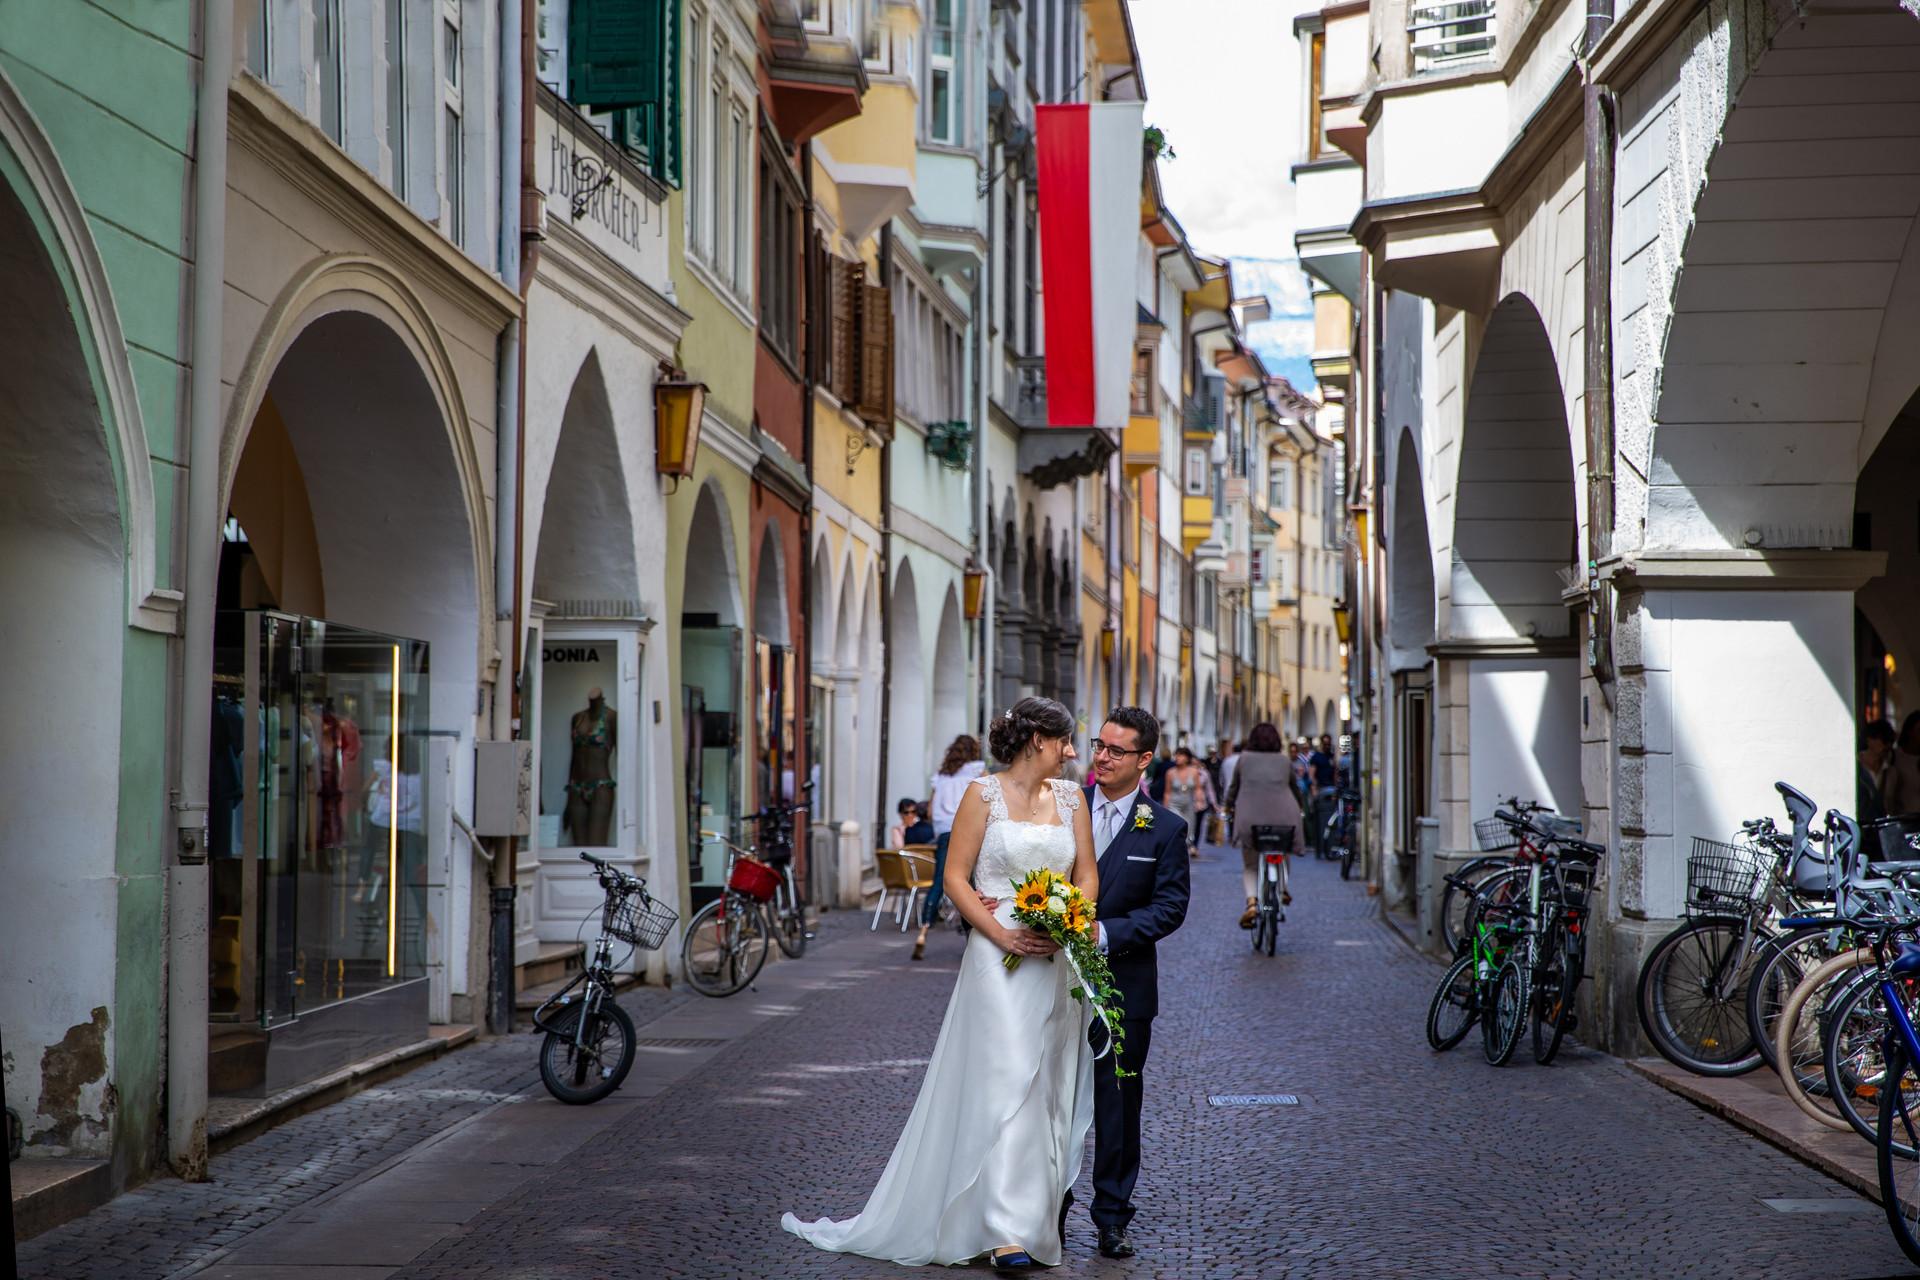 Fotografo matrimonio Bolzano, Location ricevimento Pinzonerkeller